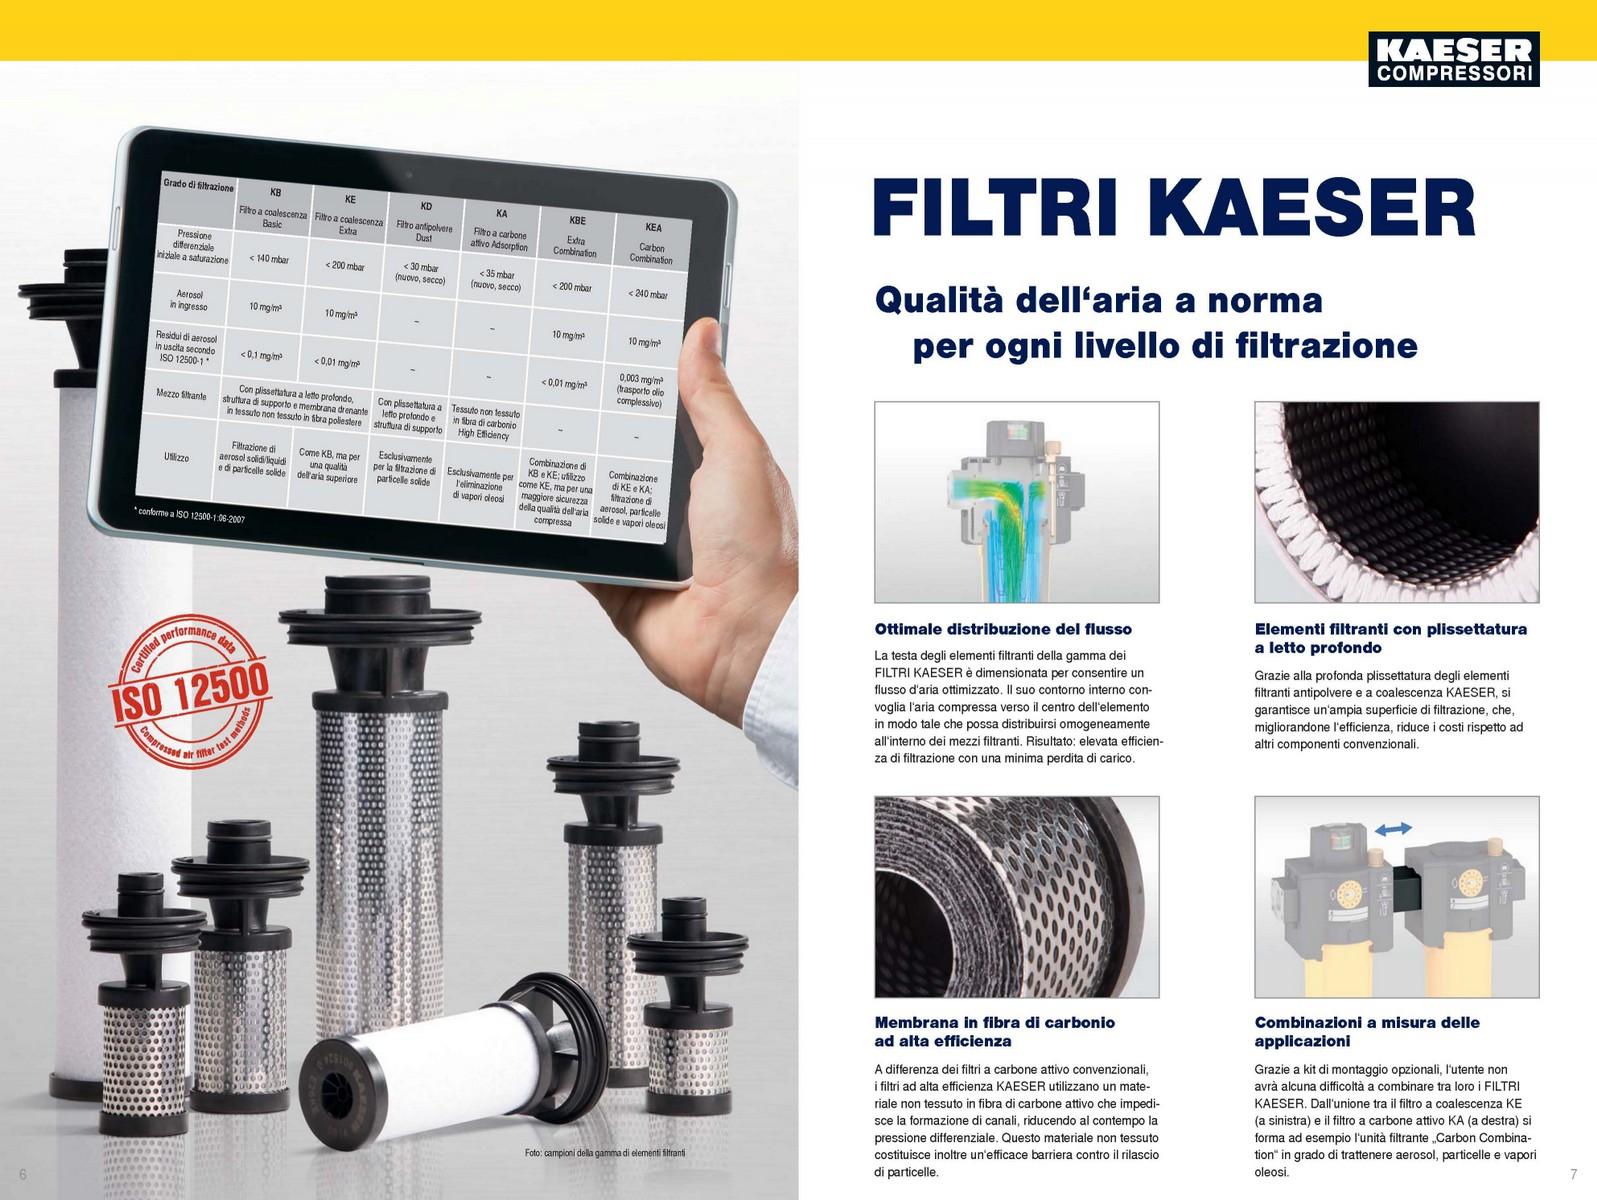 Filtri per aria compressa Kaeser KB-KE-KD-KA - Airservice24 Snc